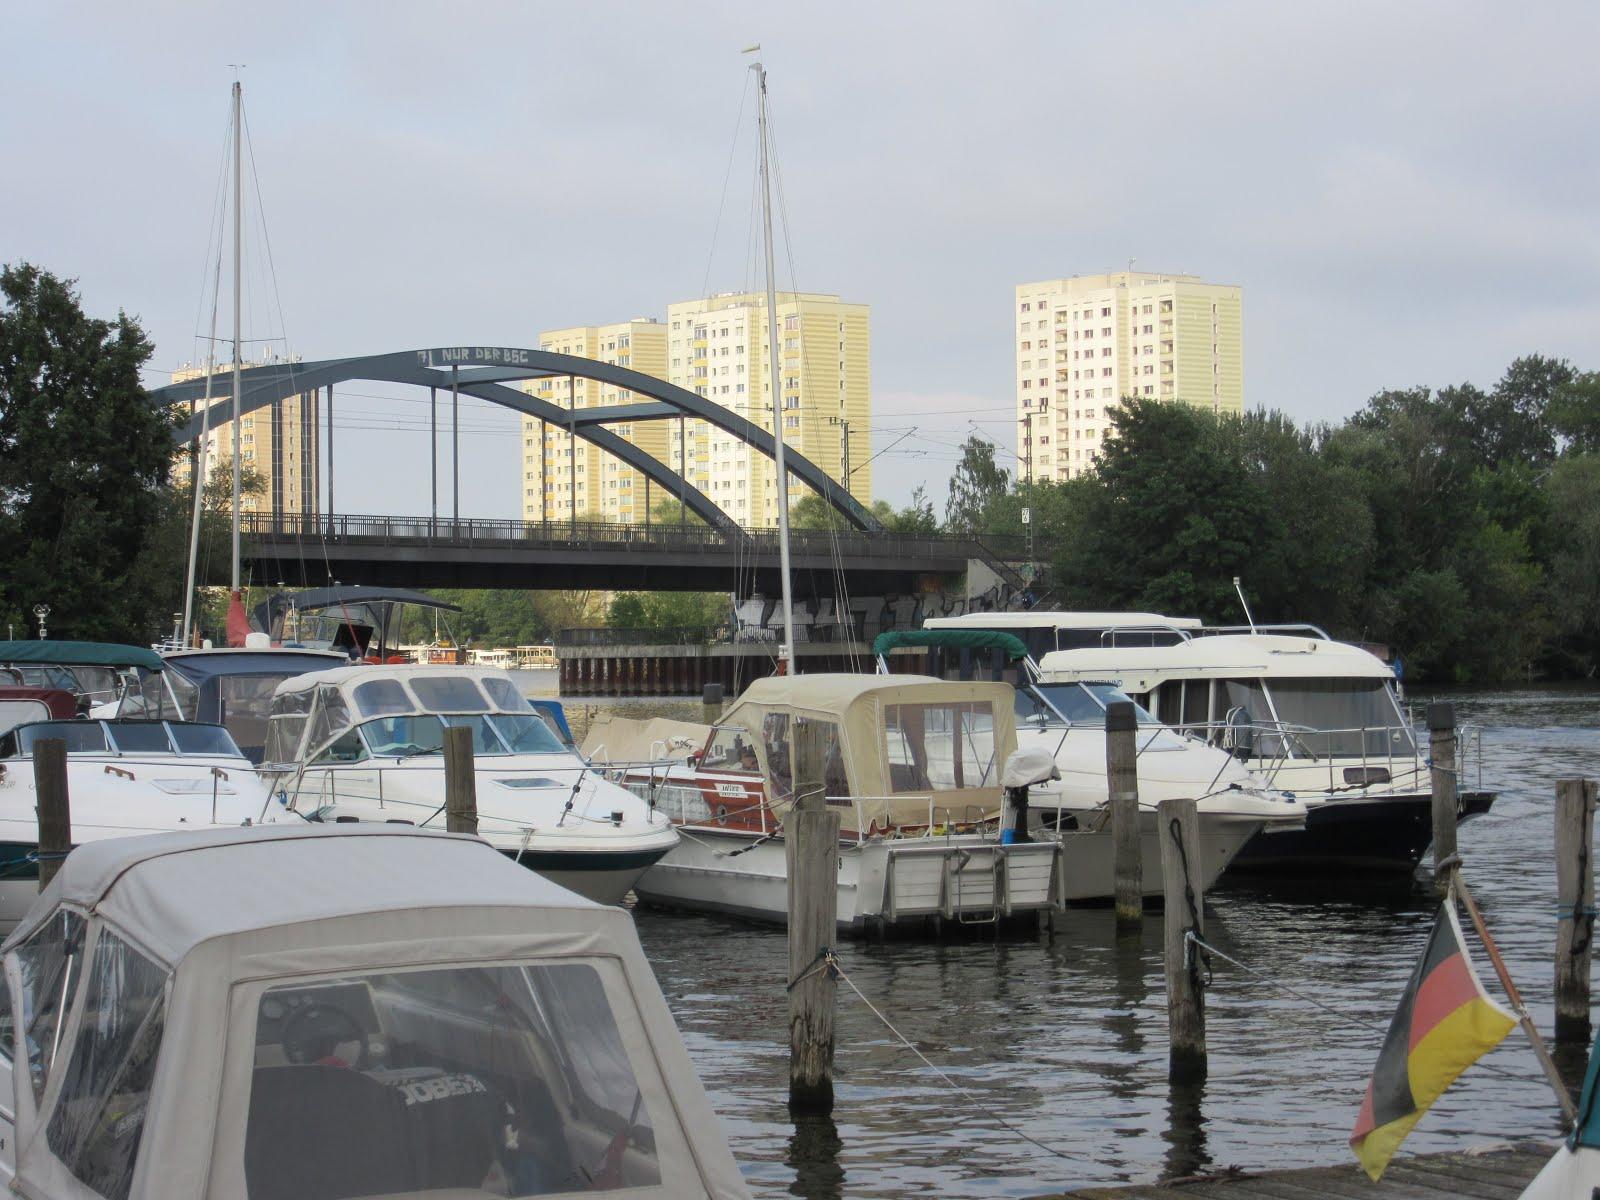 Kiewitt-Hafen